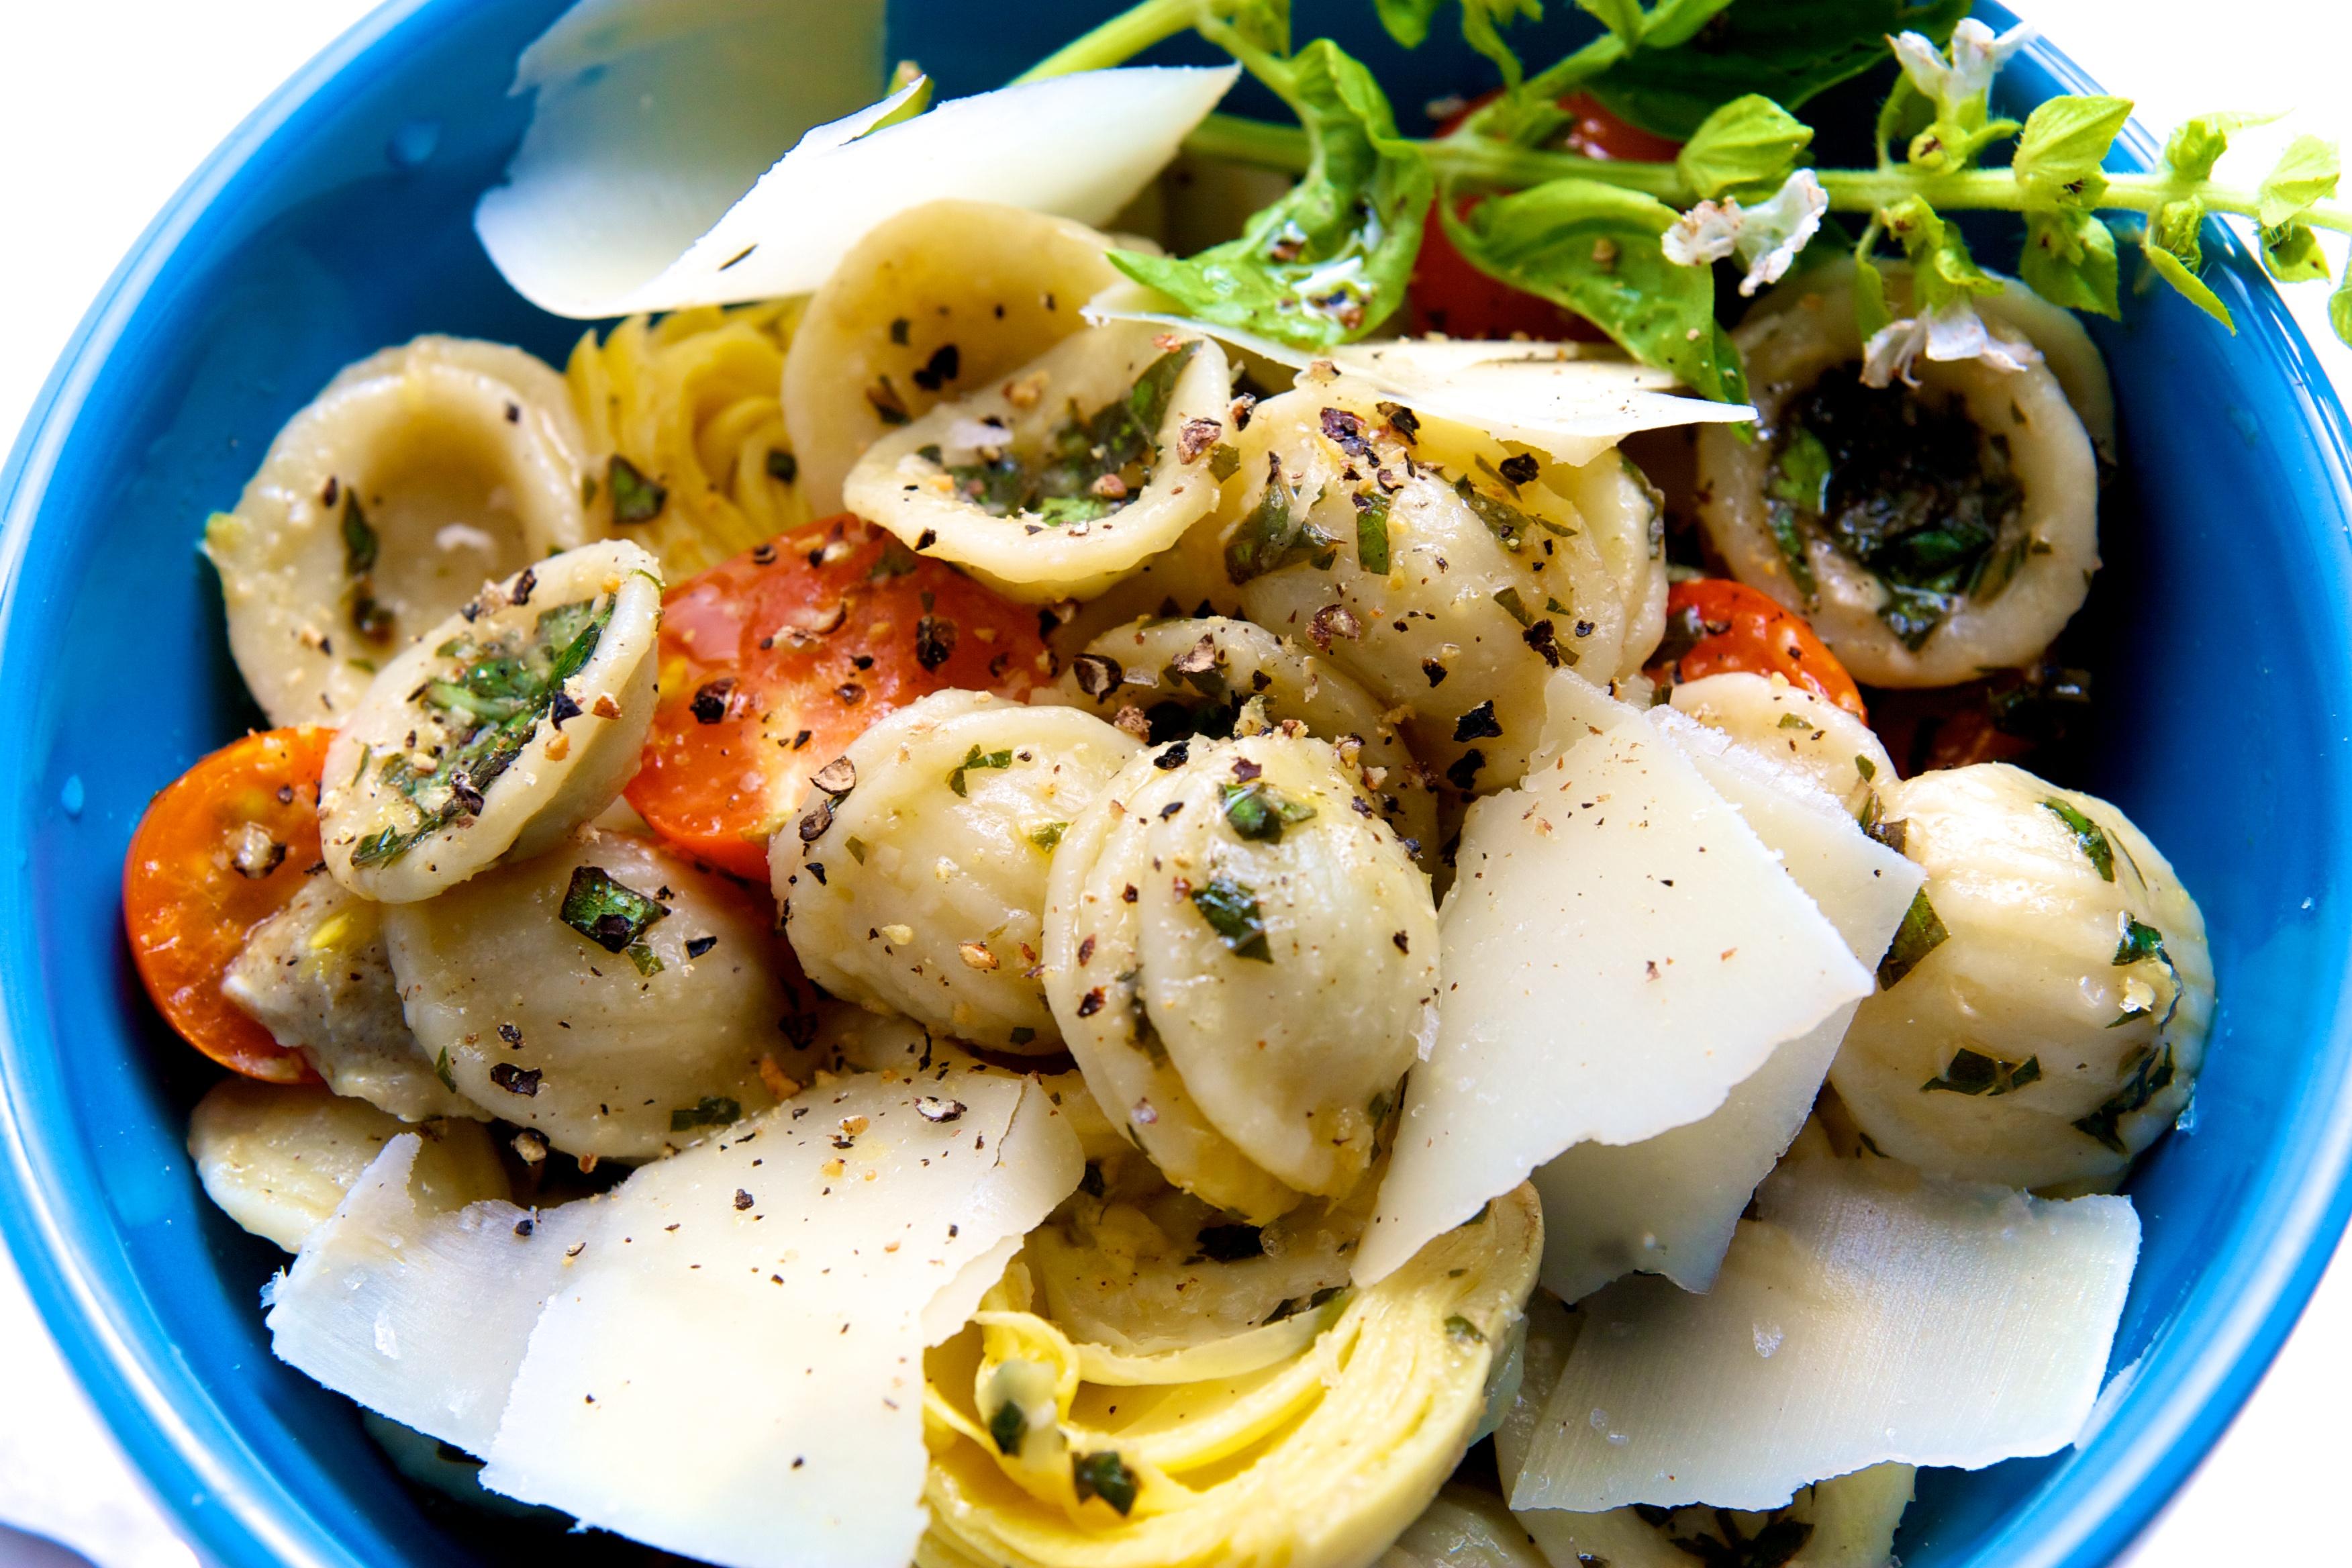 Orecchiette with Lemon Basil Pesto, Cherry Tomatoes & Artichokes